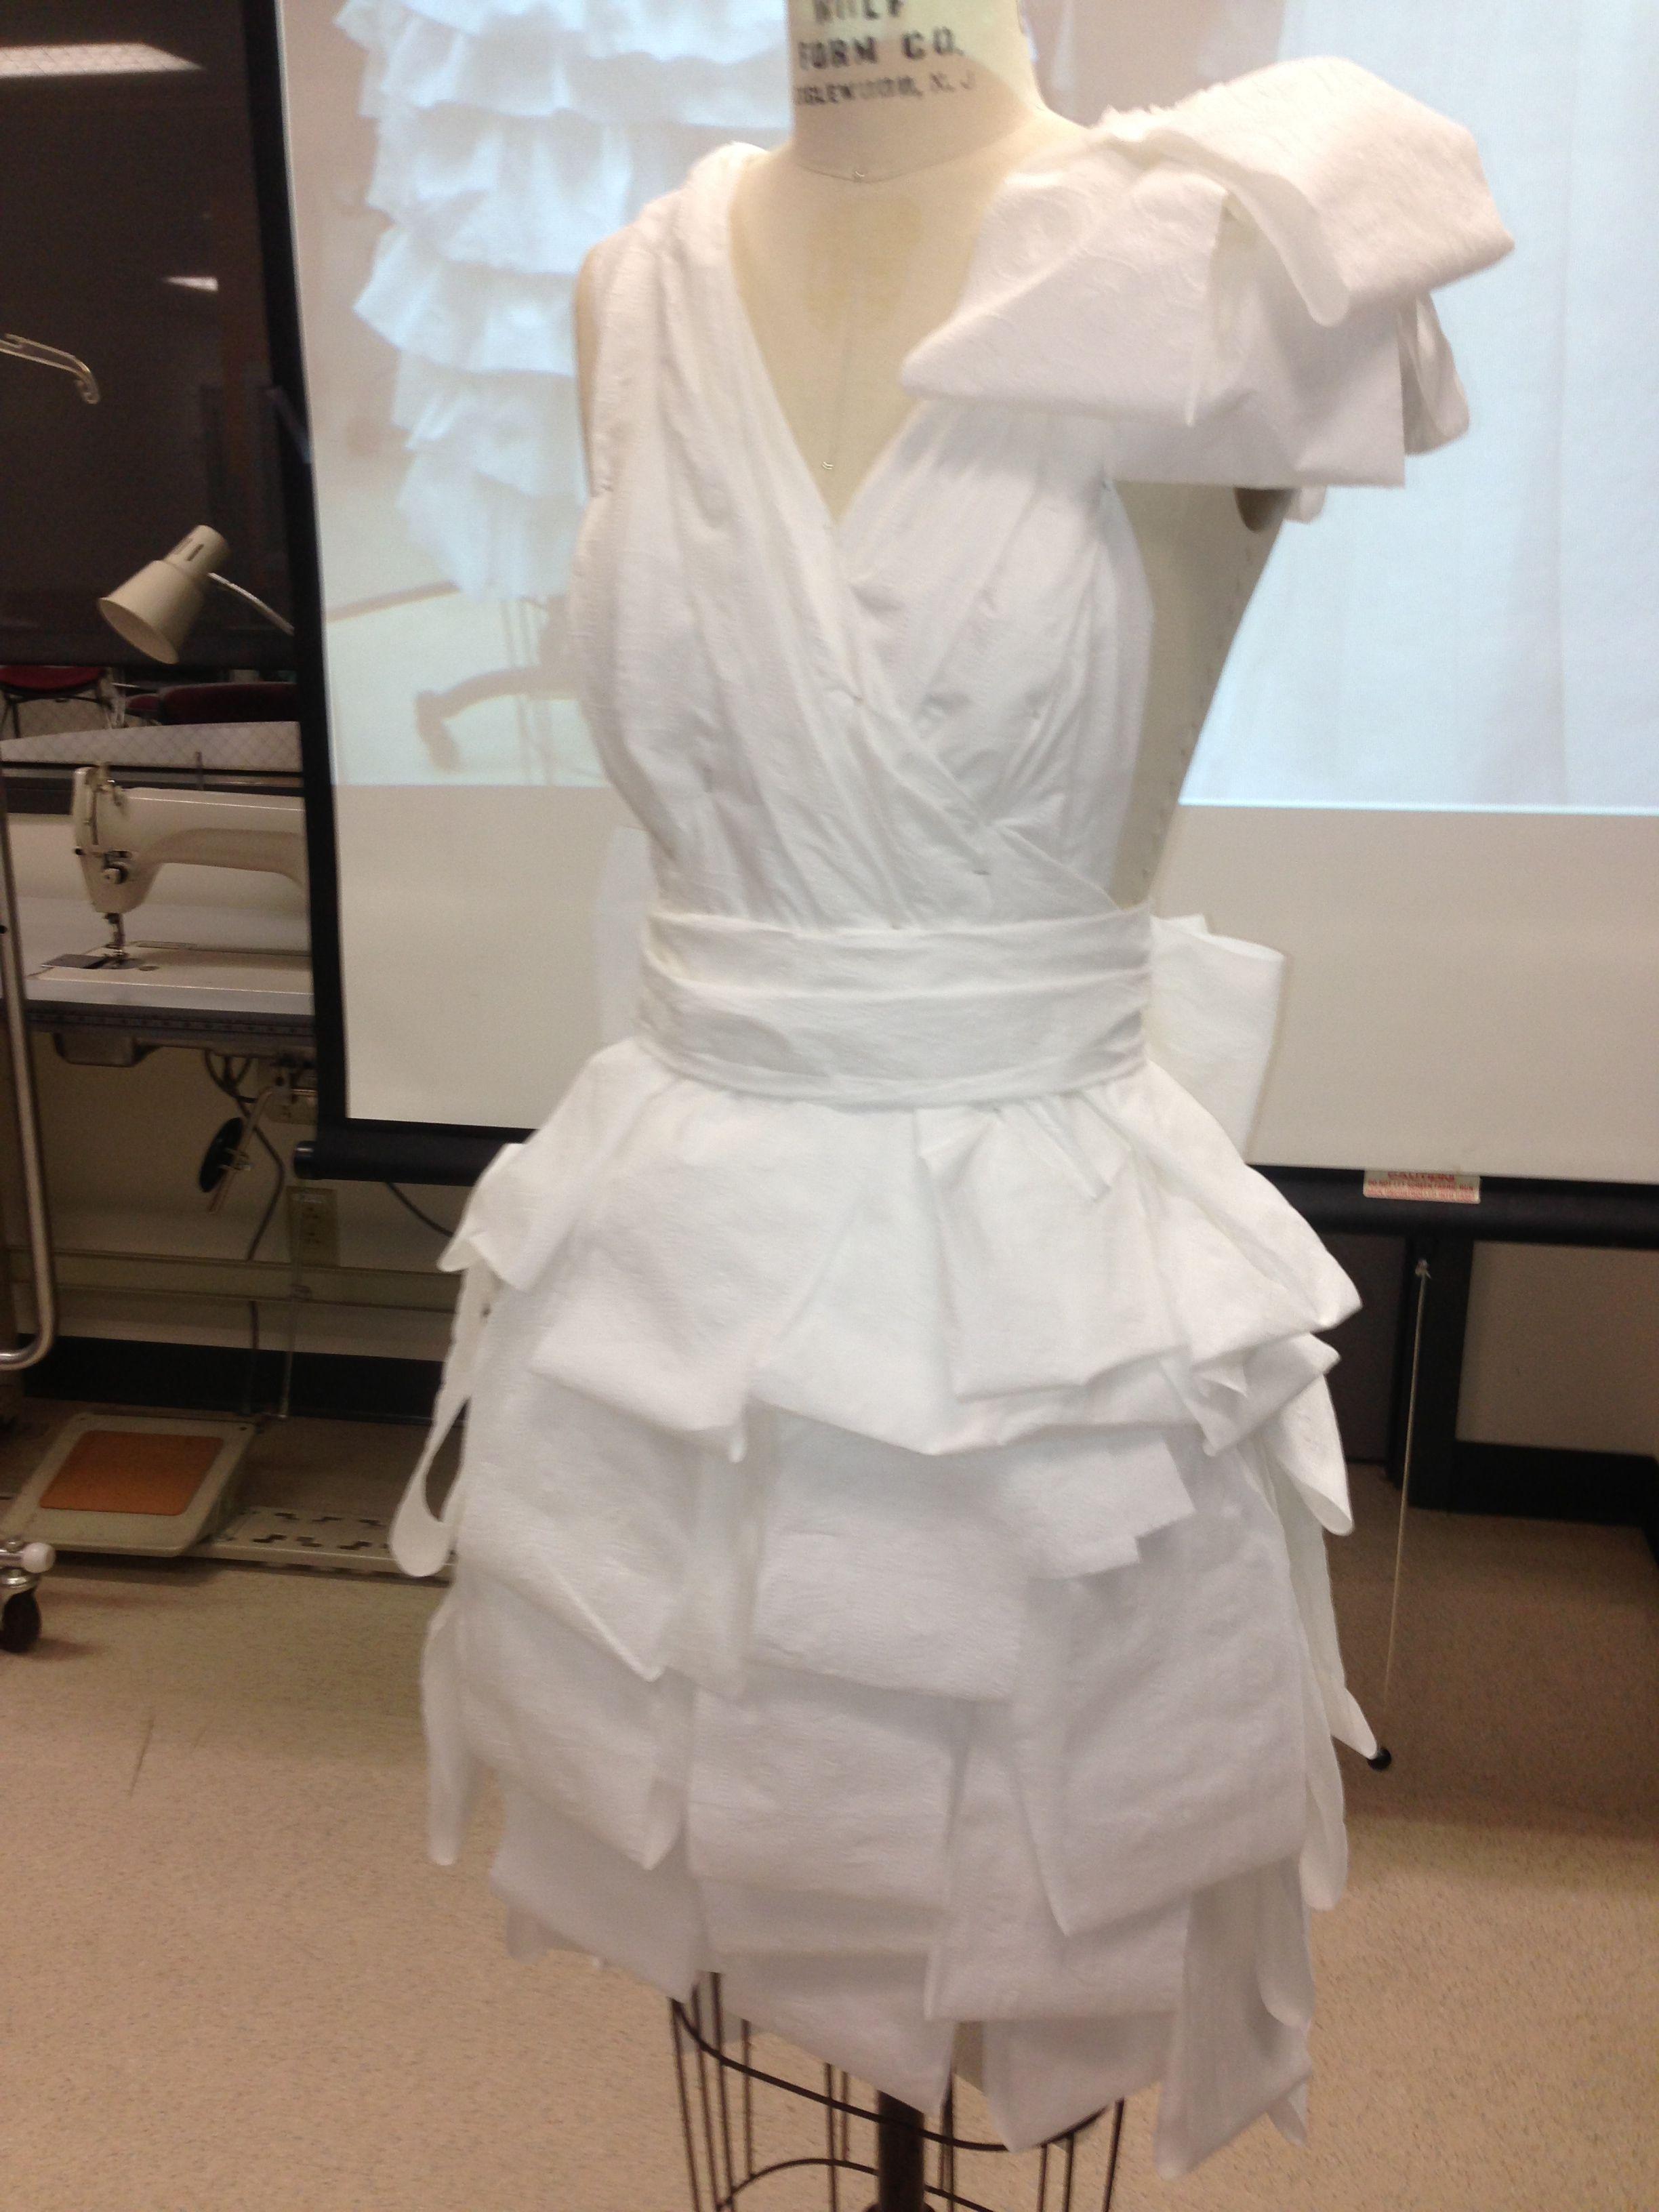 Toilet Paper Wedding Dress Fashion Show Dresses Toilet Paper Wedding Dress Paper Dress